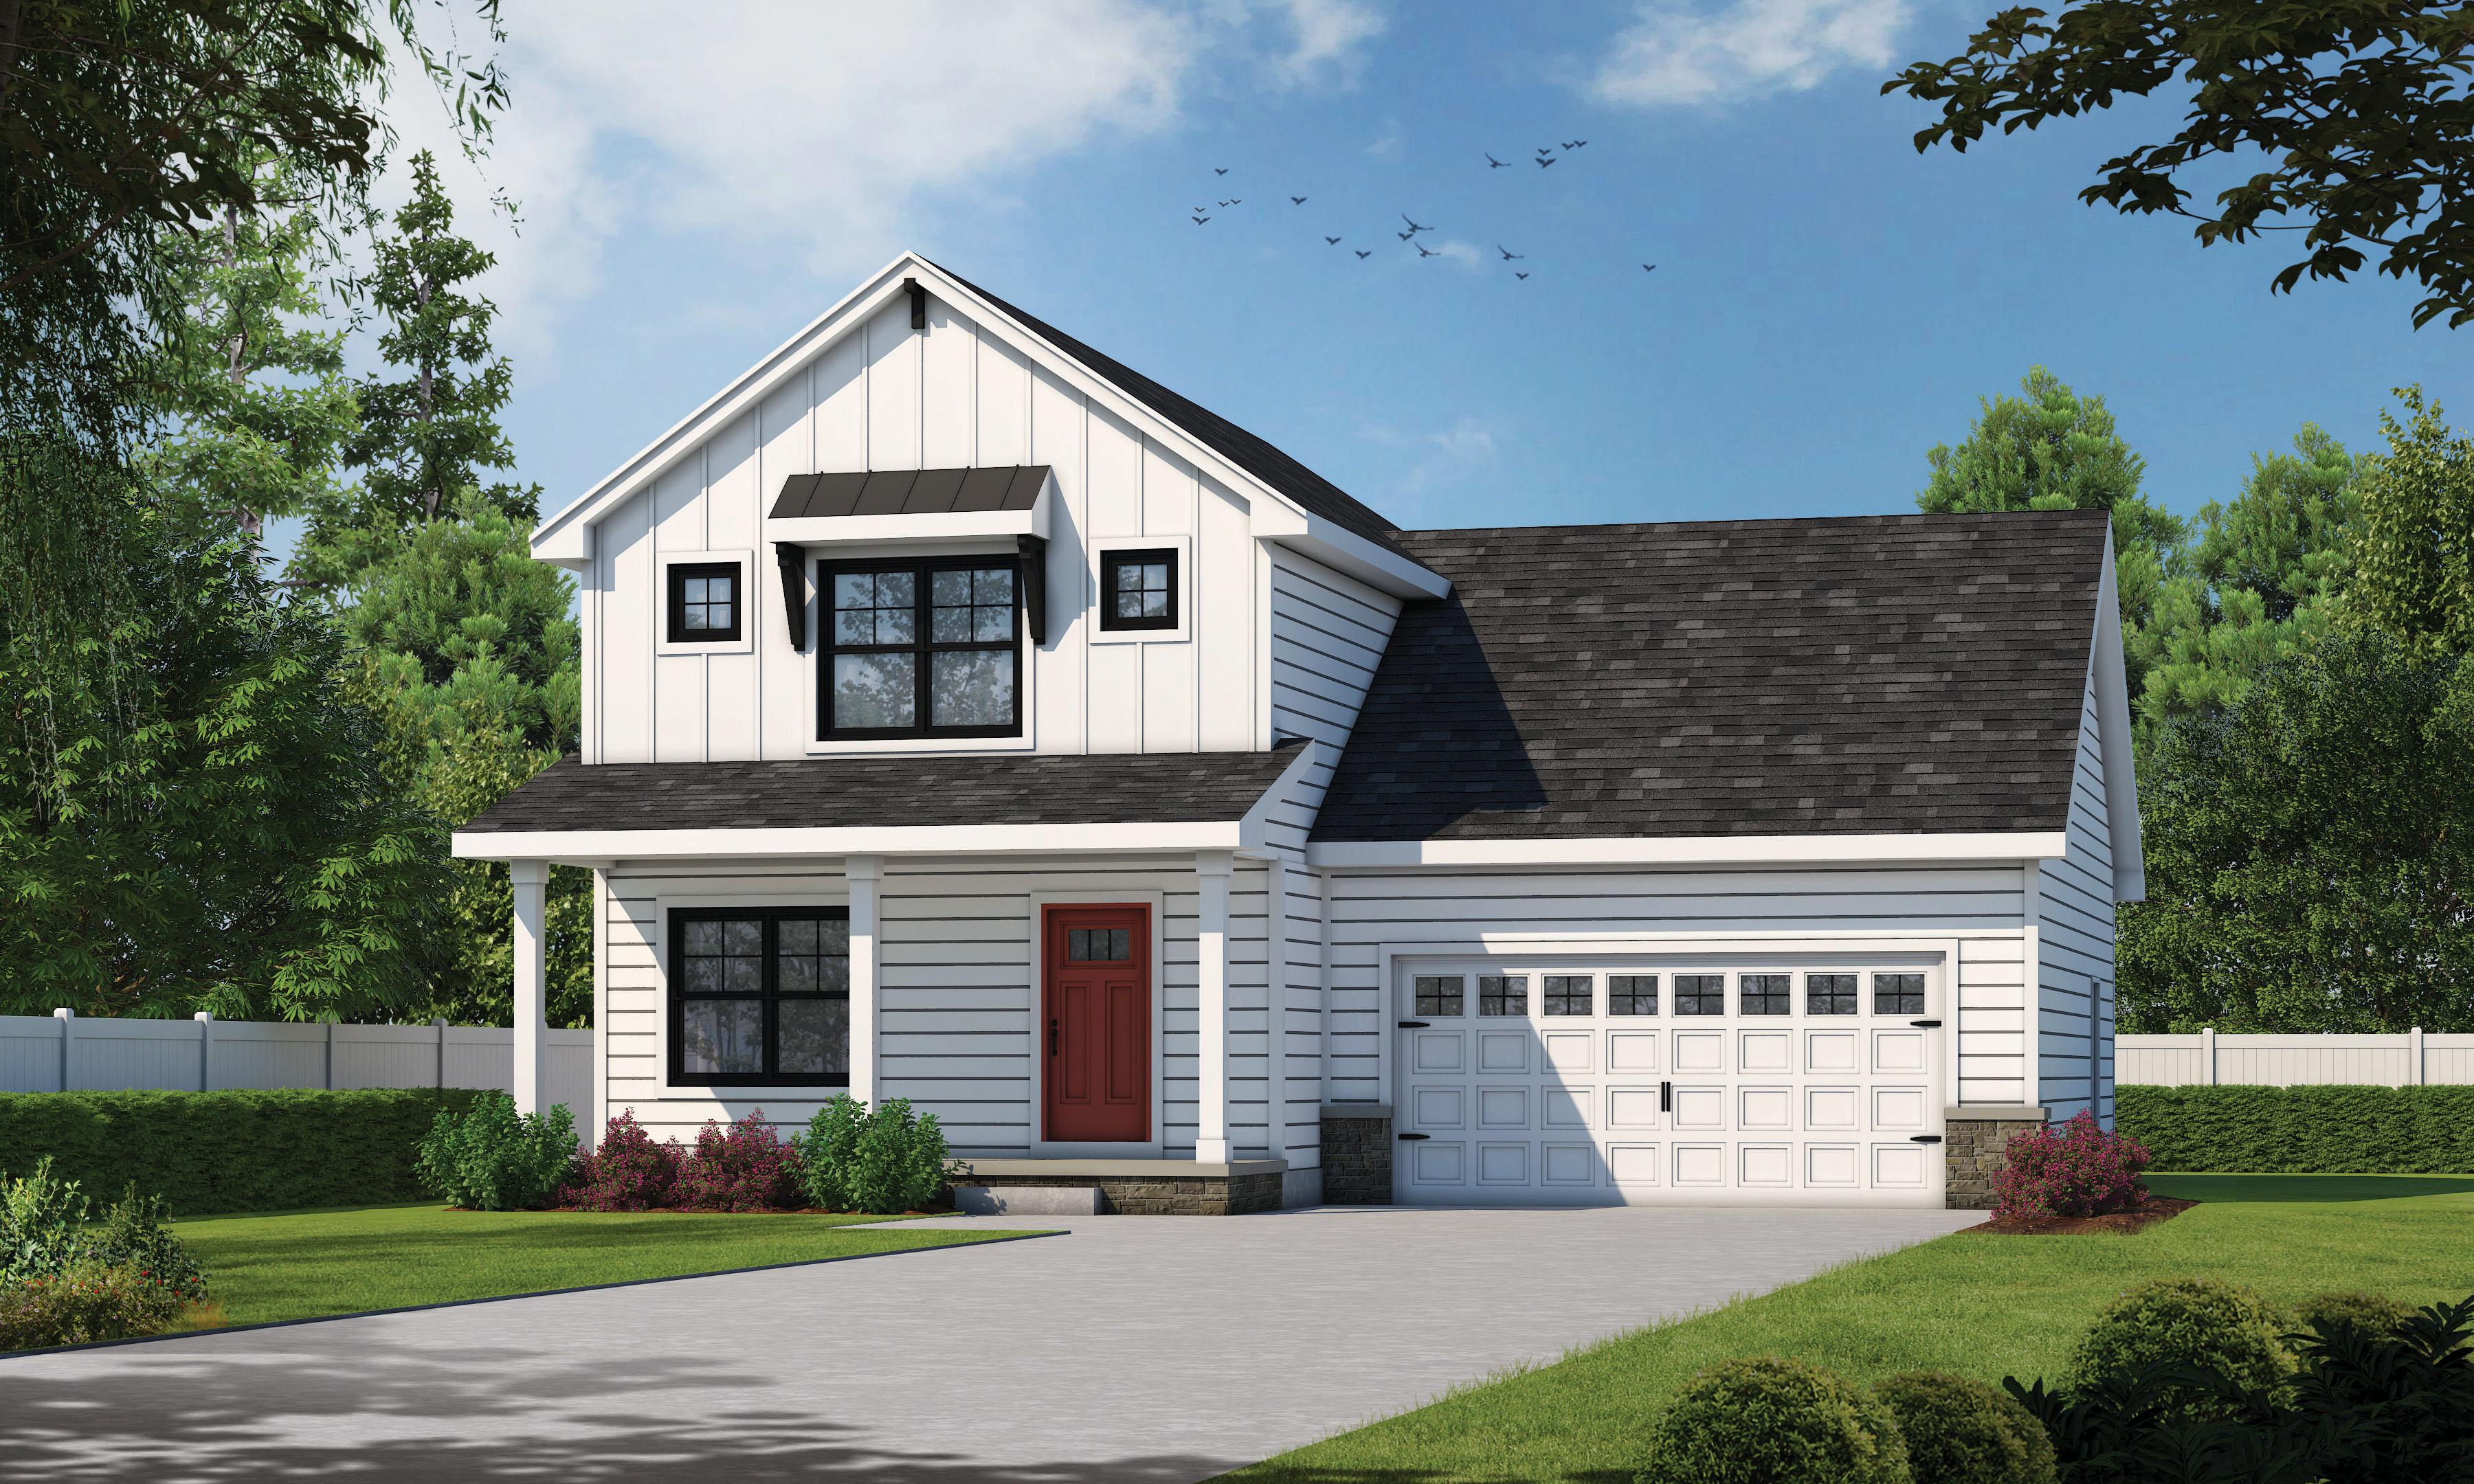 Modern-farmhouse Style Home Design Plan: 10-1908